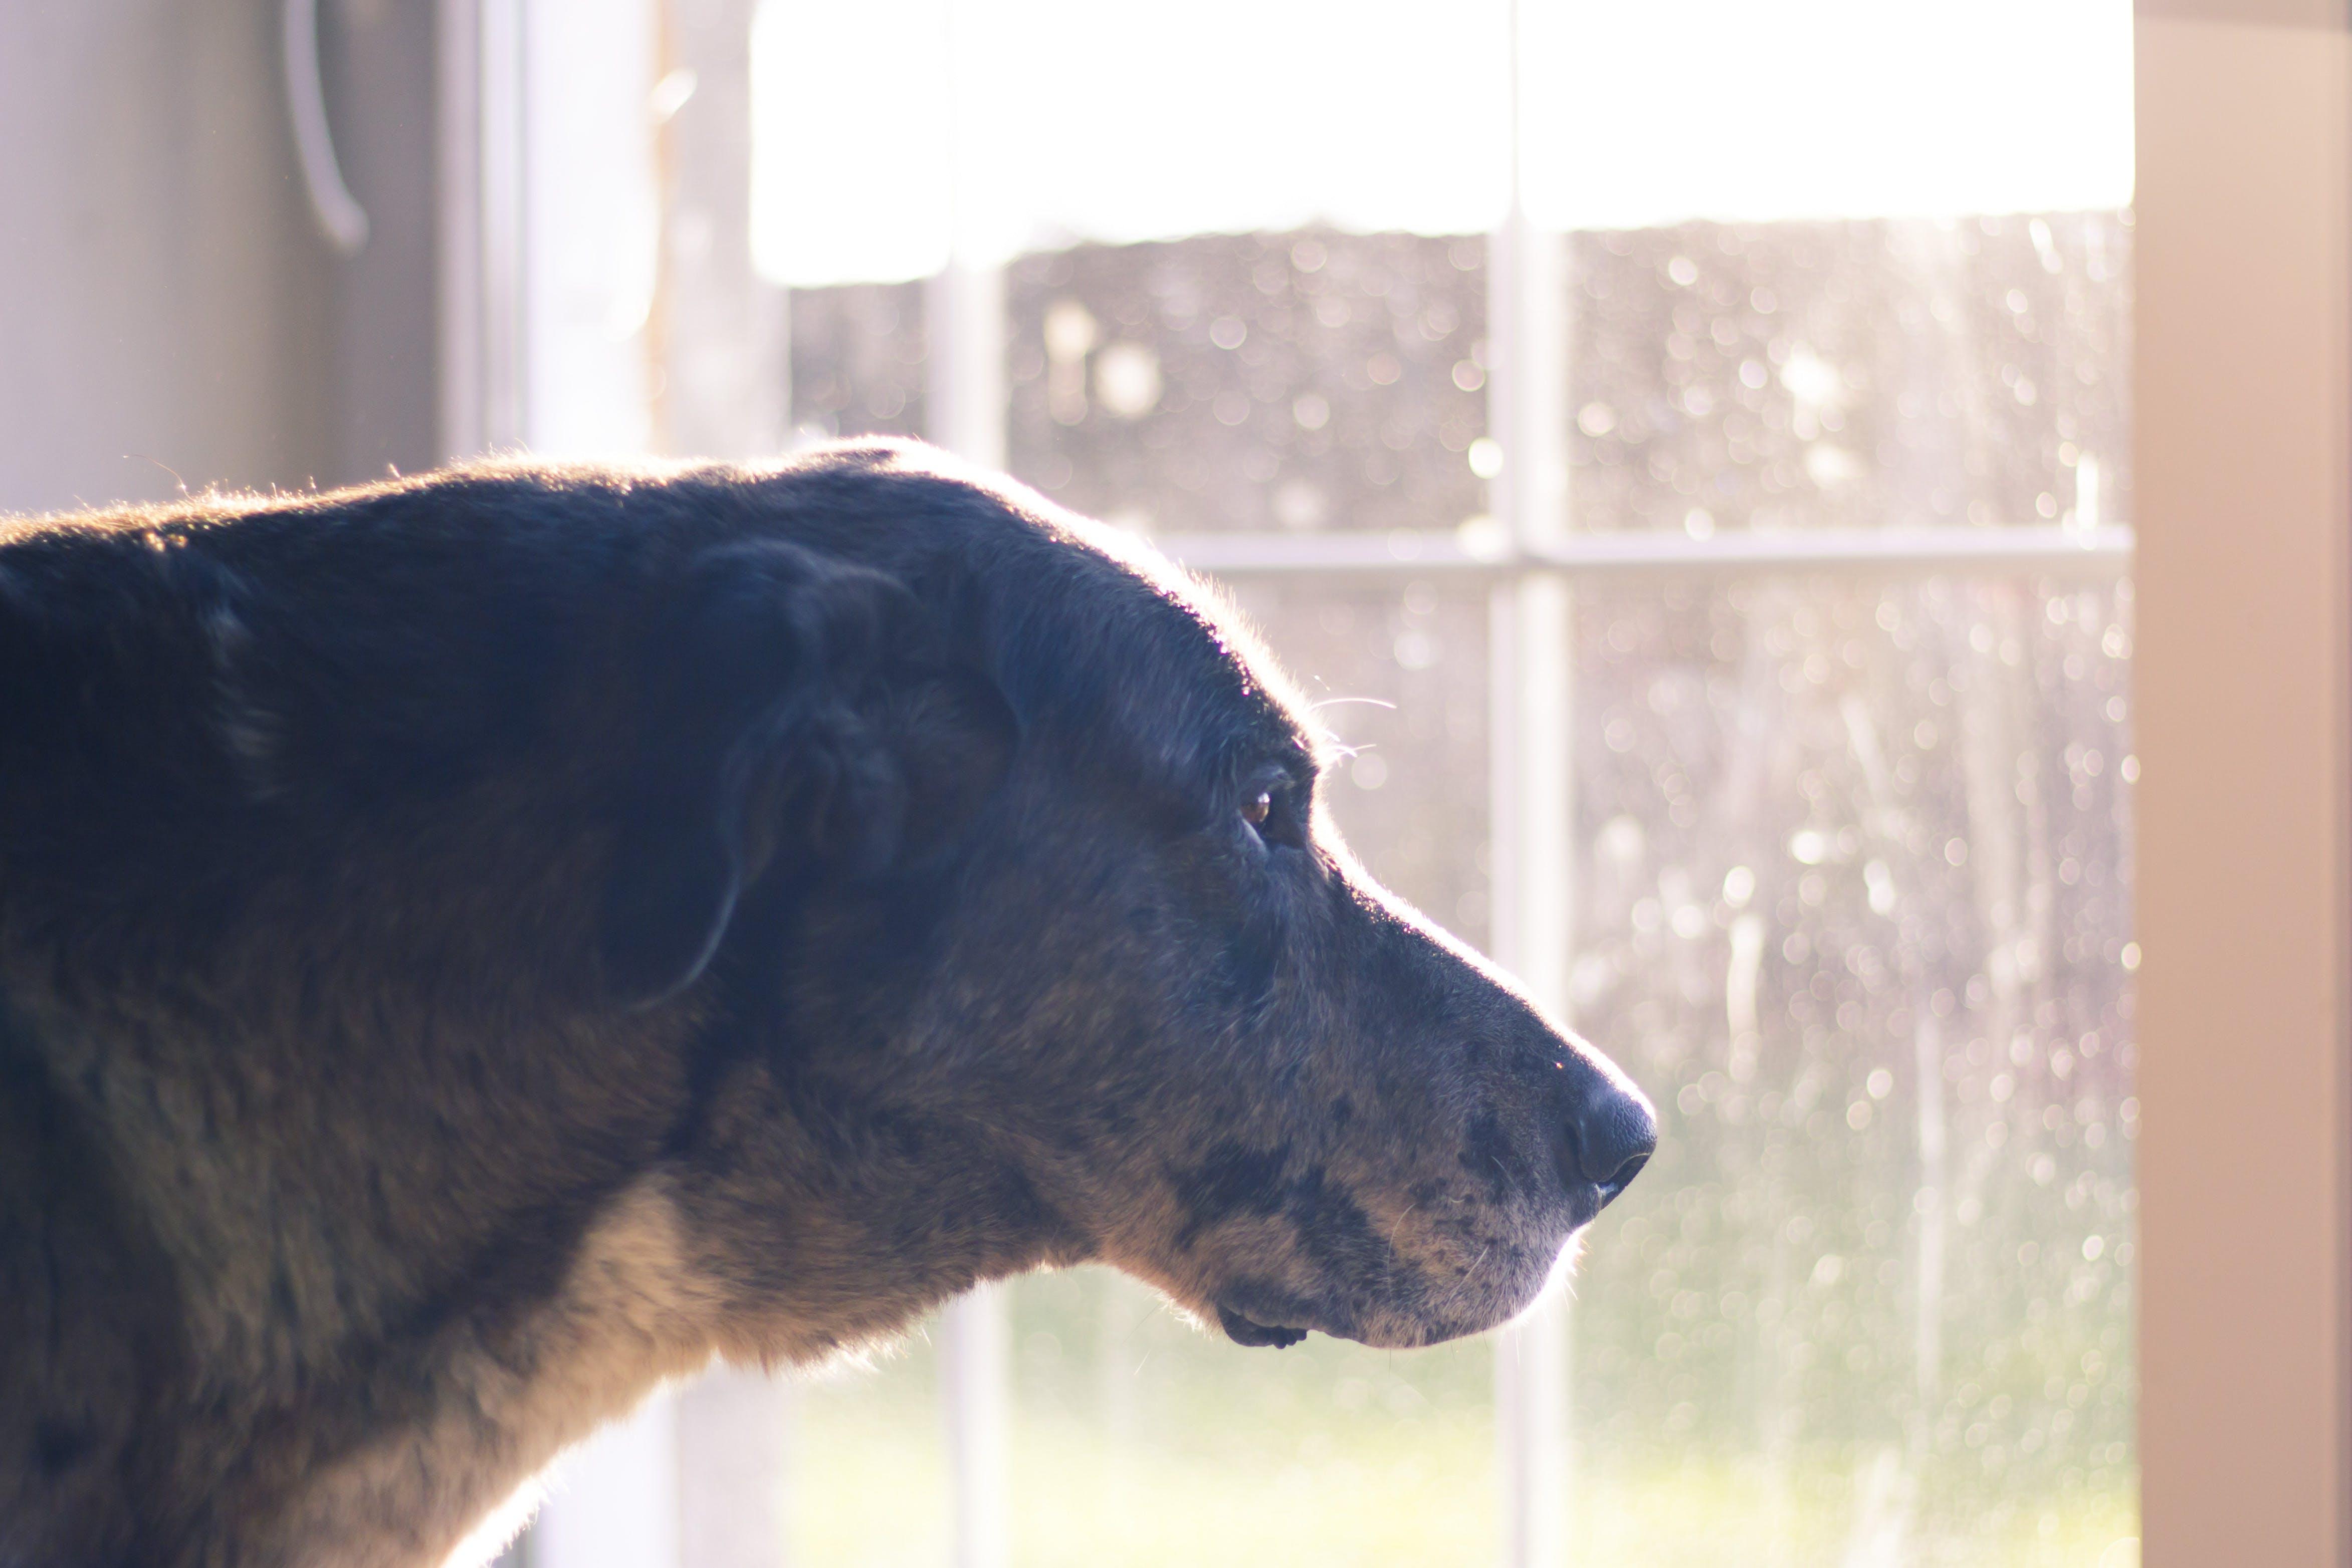 Free stock photo of dog, window